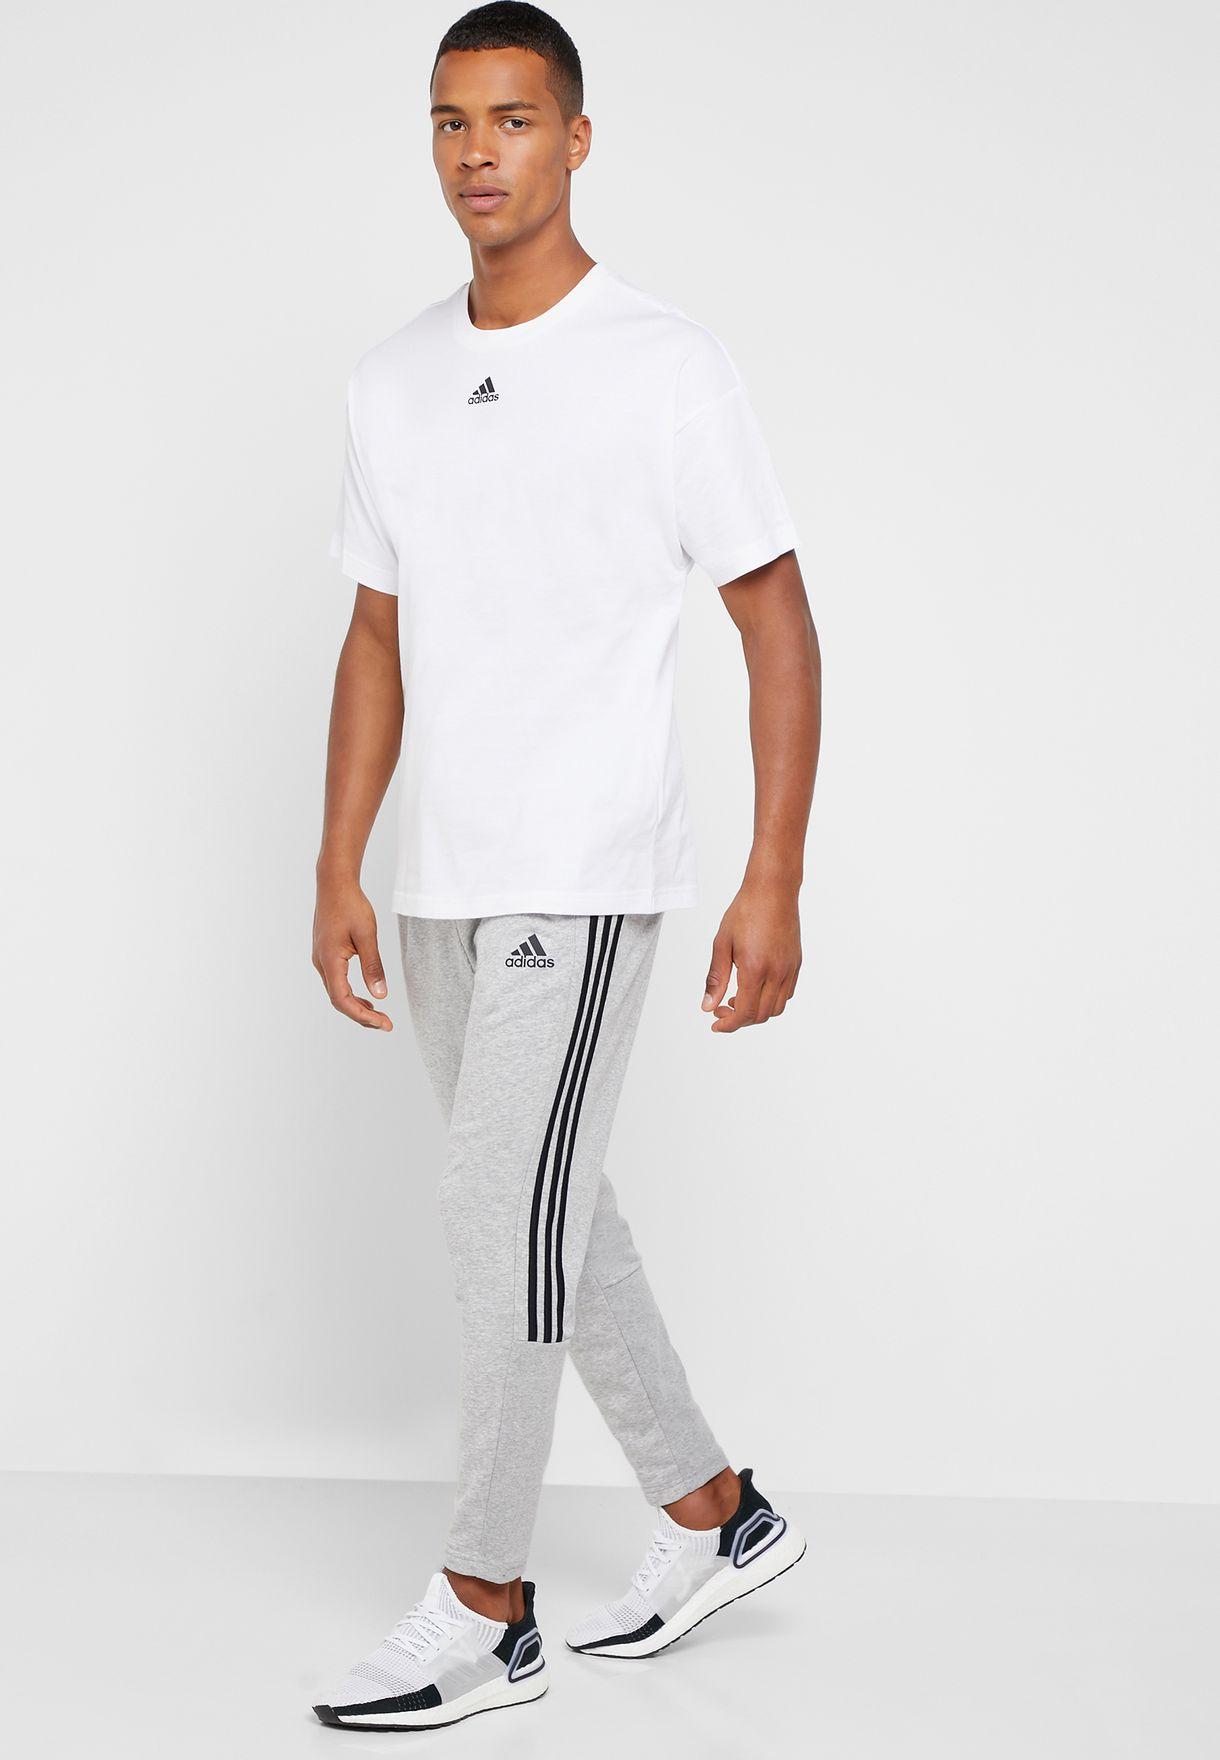 Must Have 3 Stripe Tiro Sweatpants